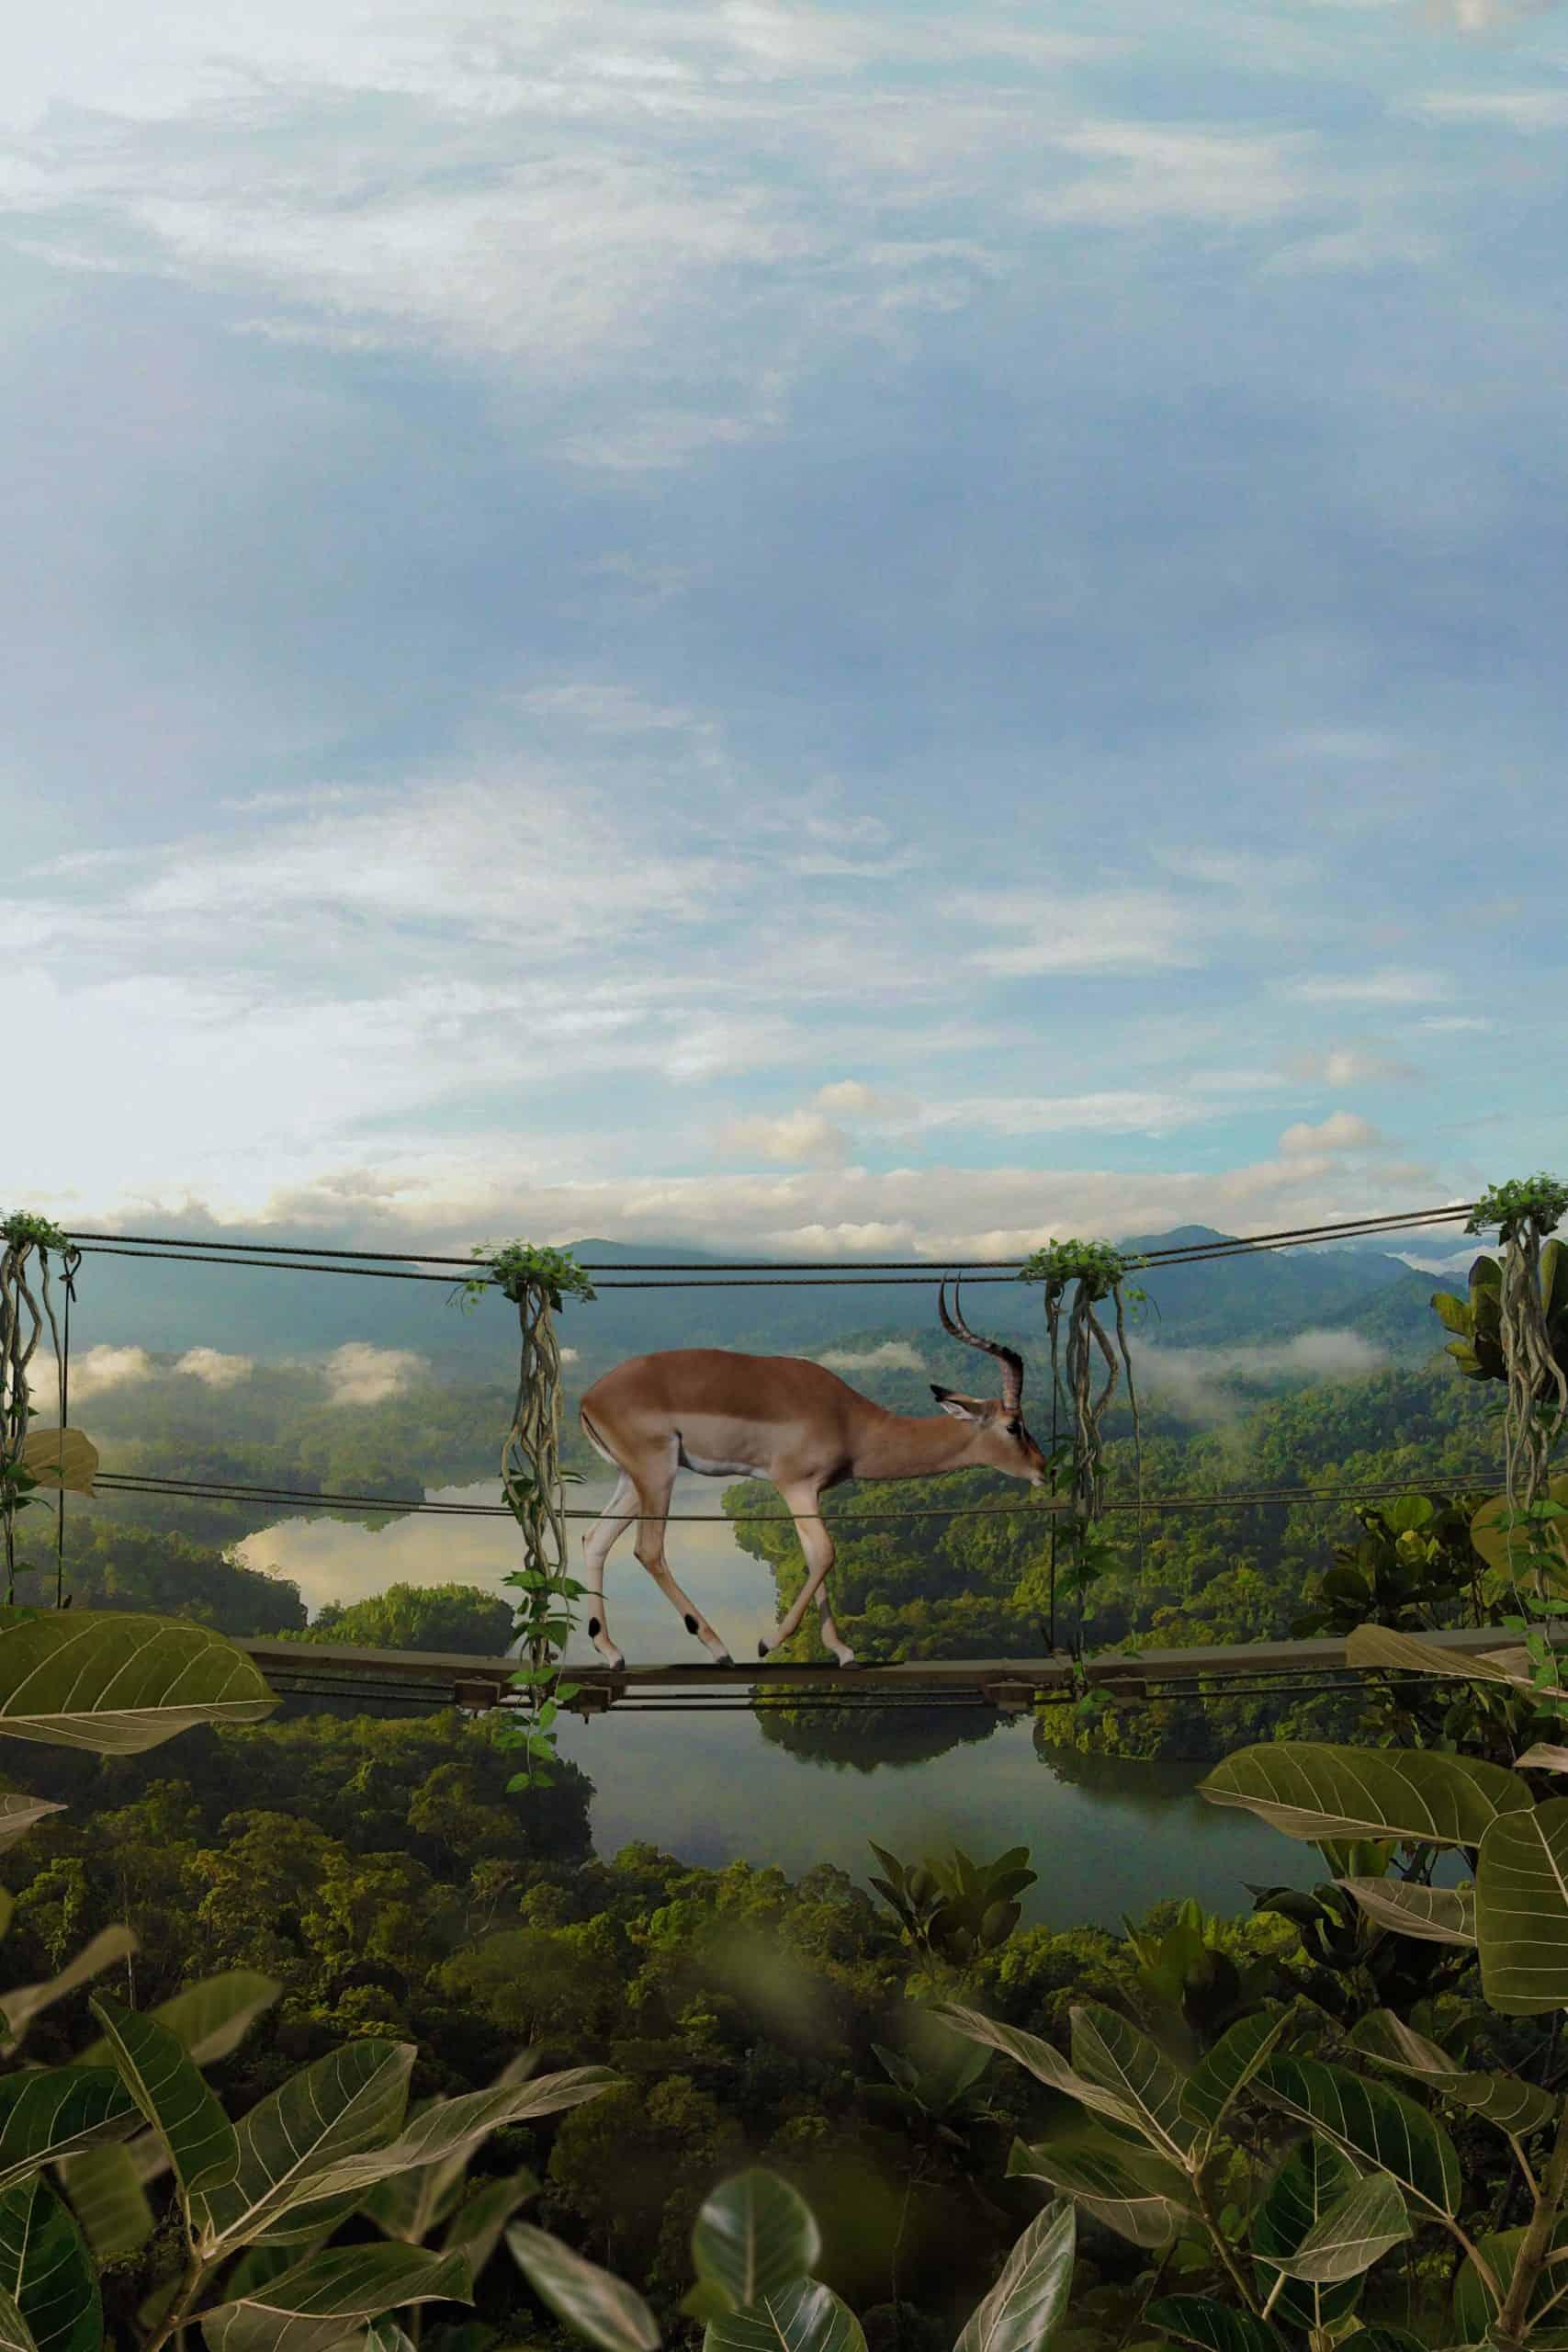 How to Create a Breathtaking Bridge Scene in Photoshop